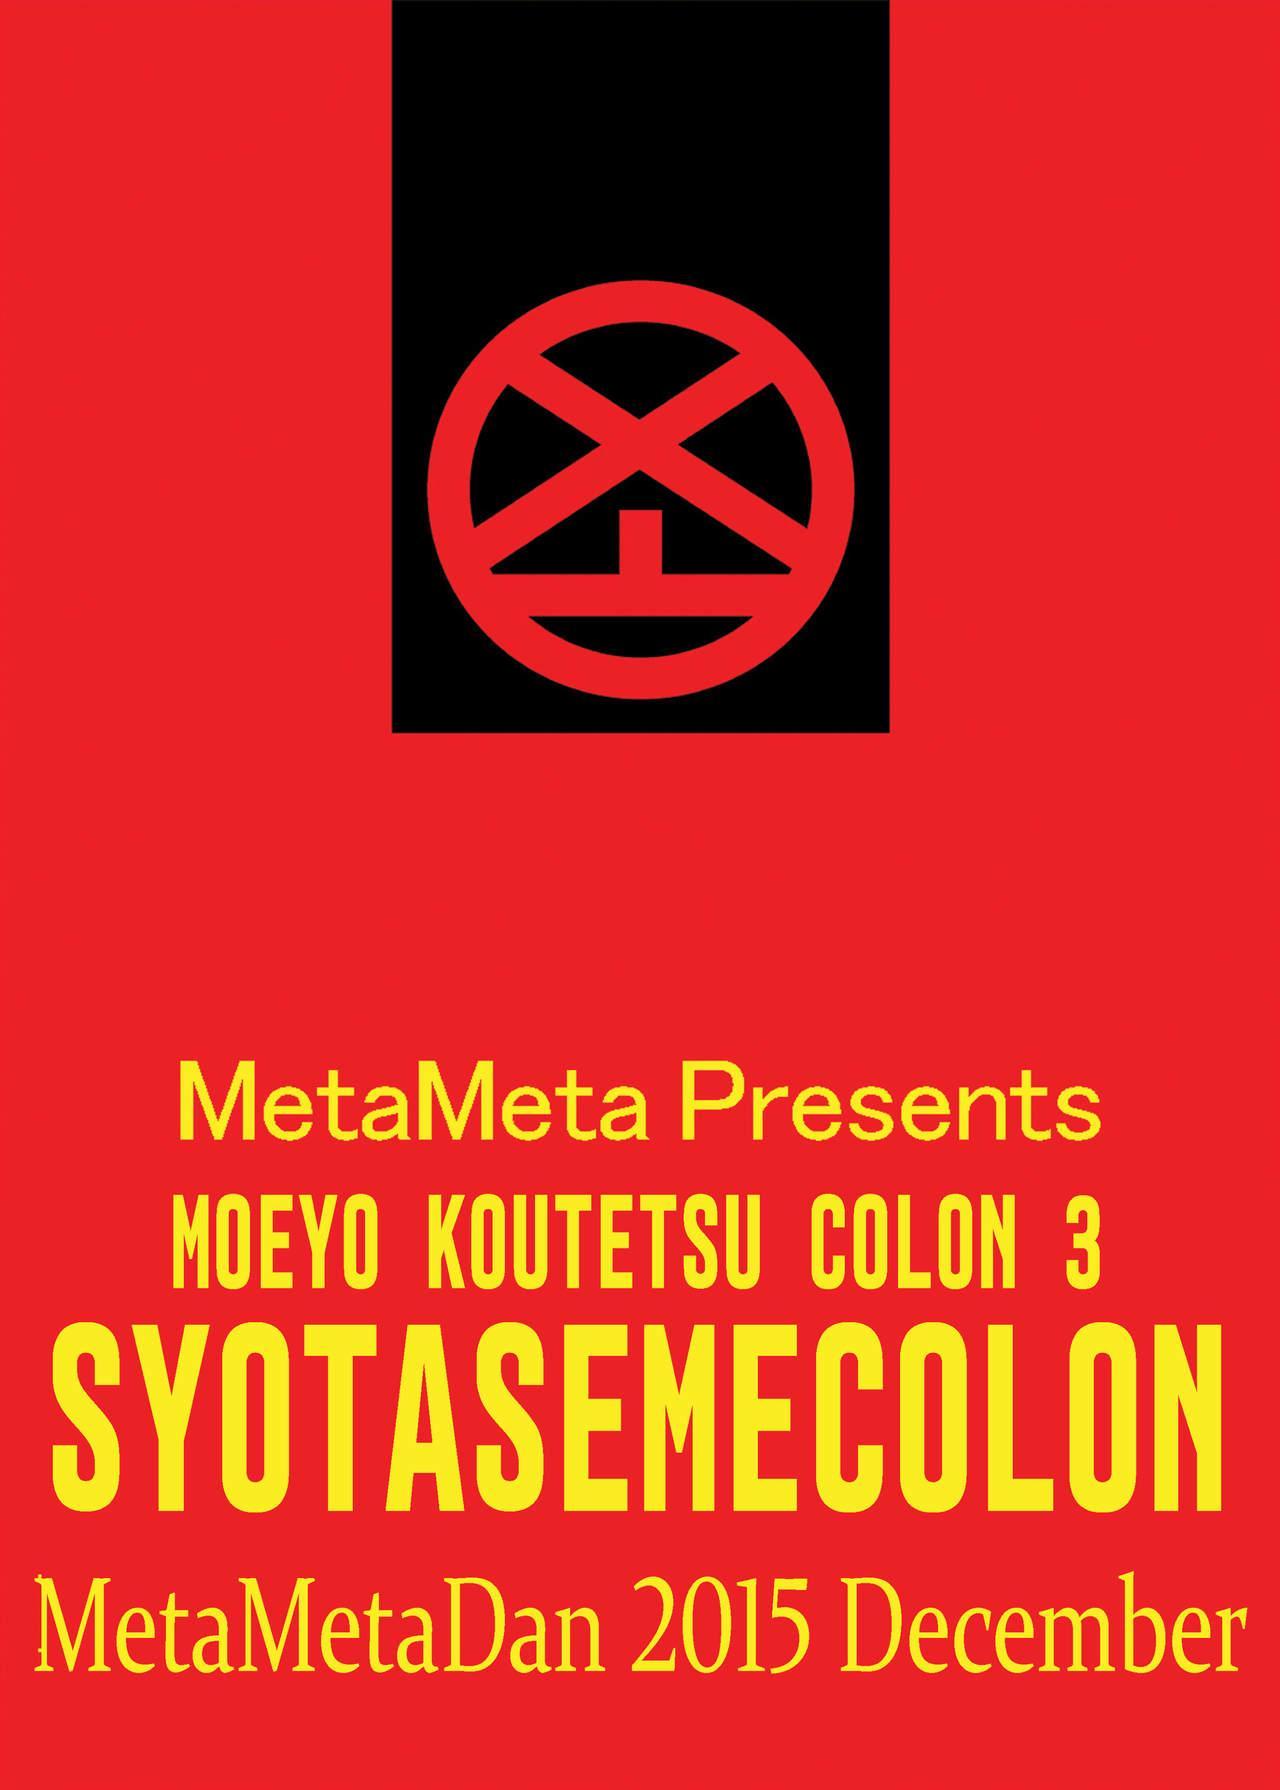 Shota Seme Colon 31